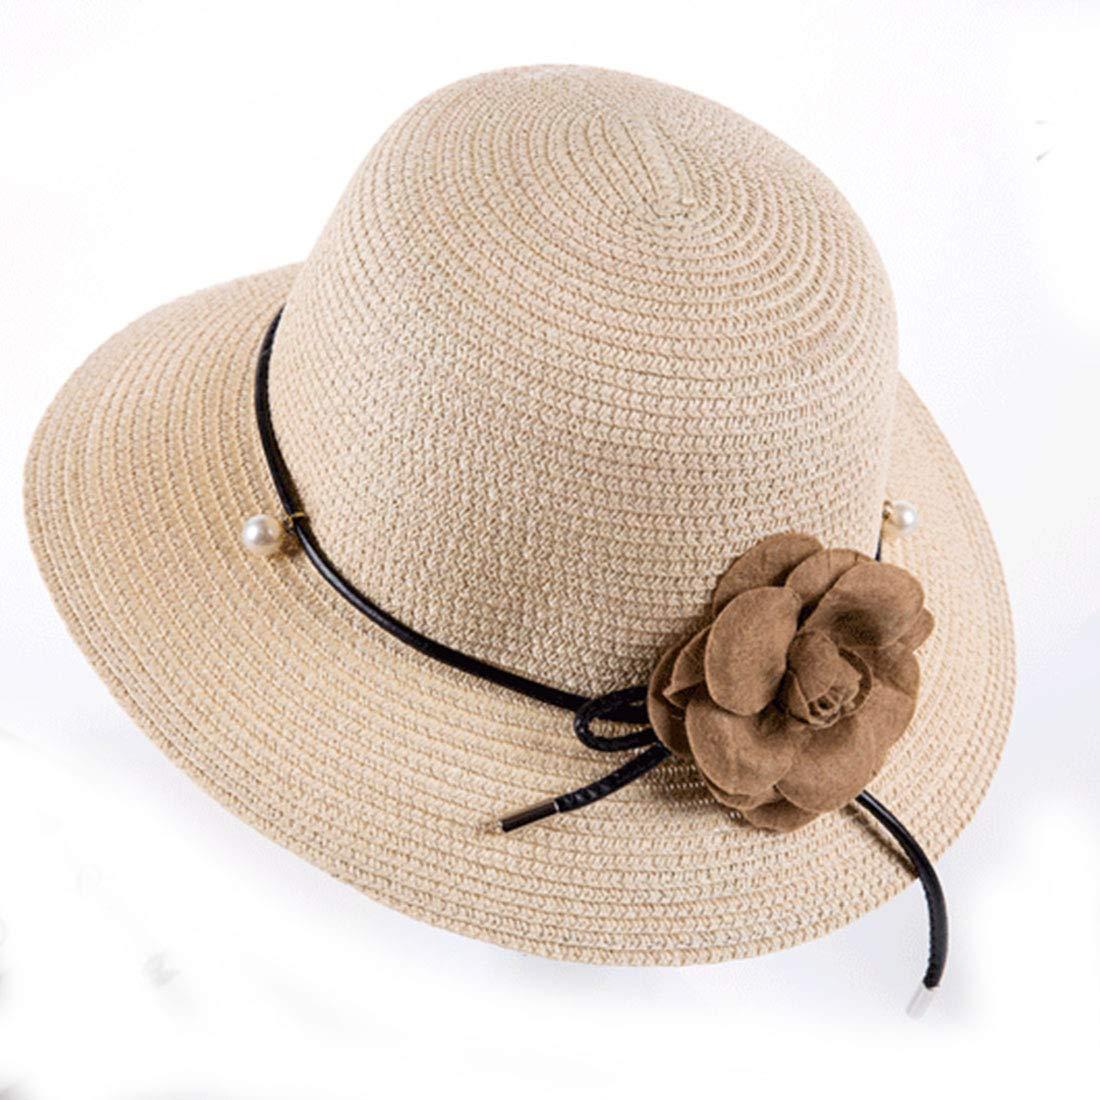 Wide Brim Straw Floppy Sun Hats for Women Travel Flower Packable Beach Hat Beige